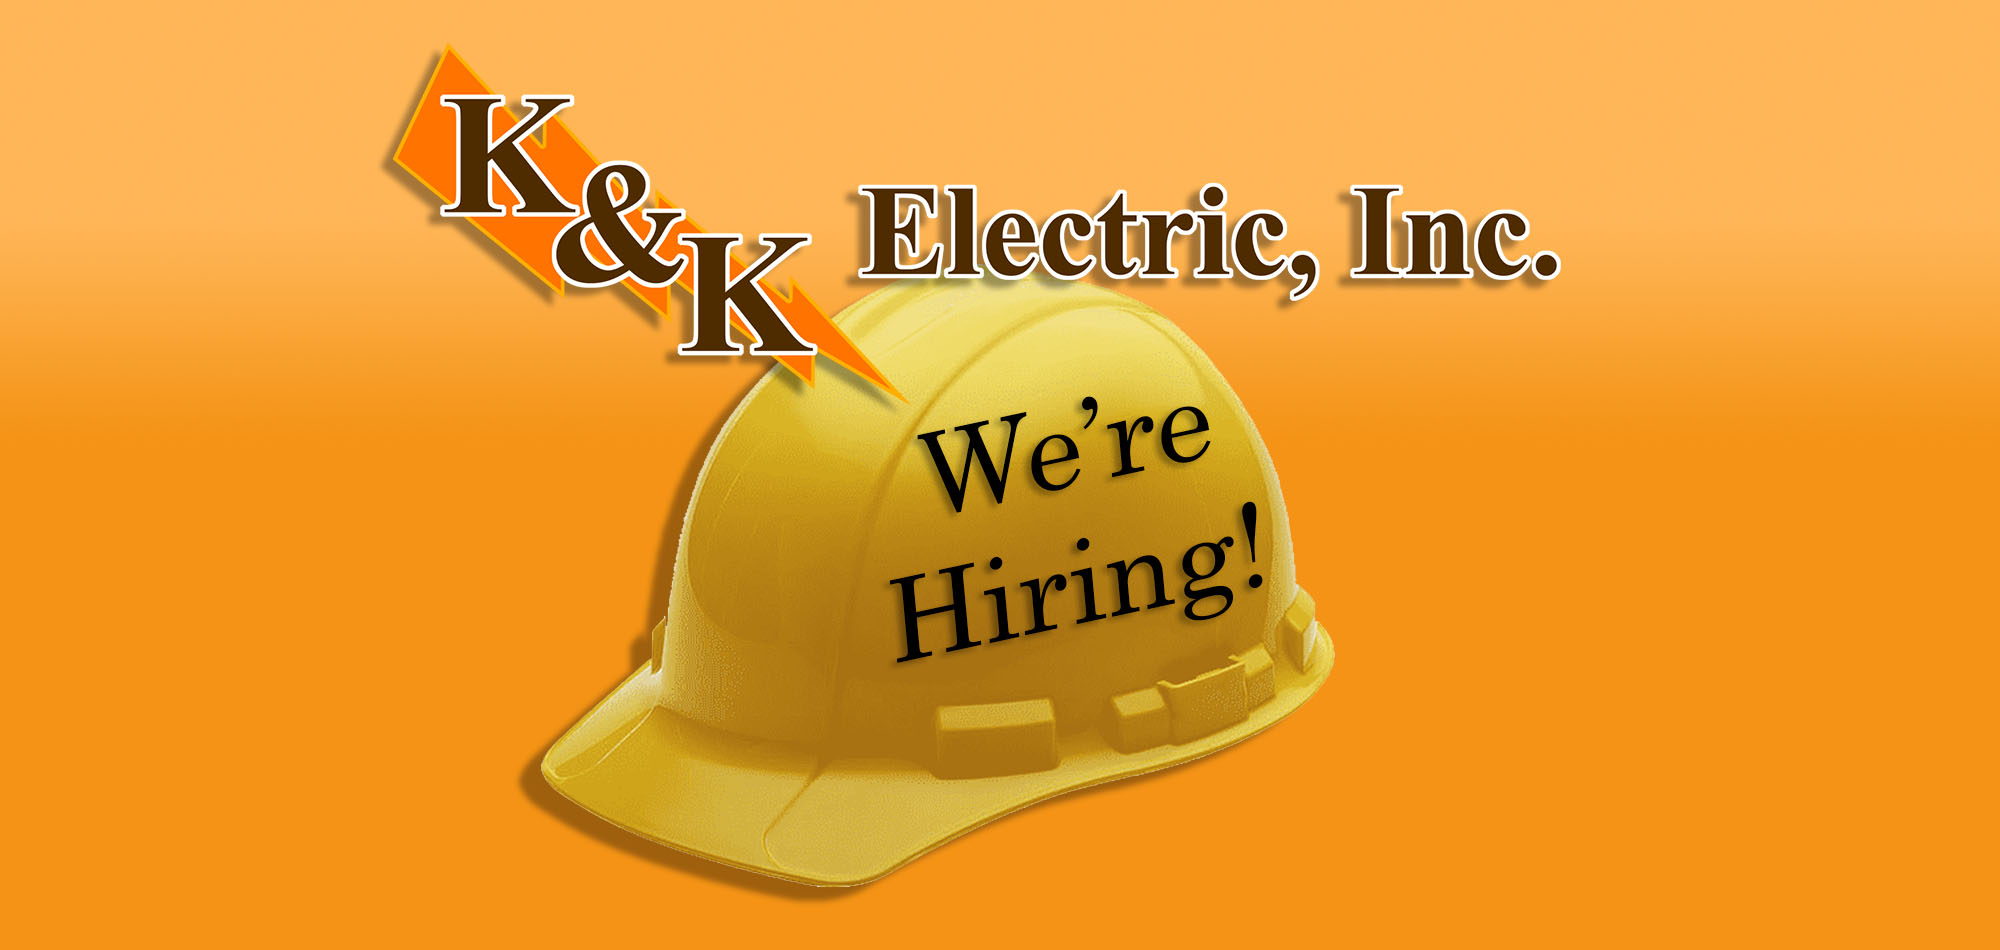 K&K Electric, Inc. - We're Hiring!